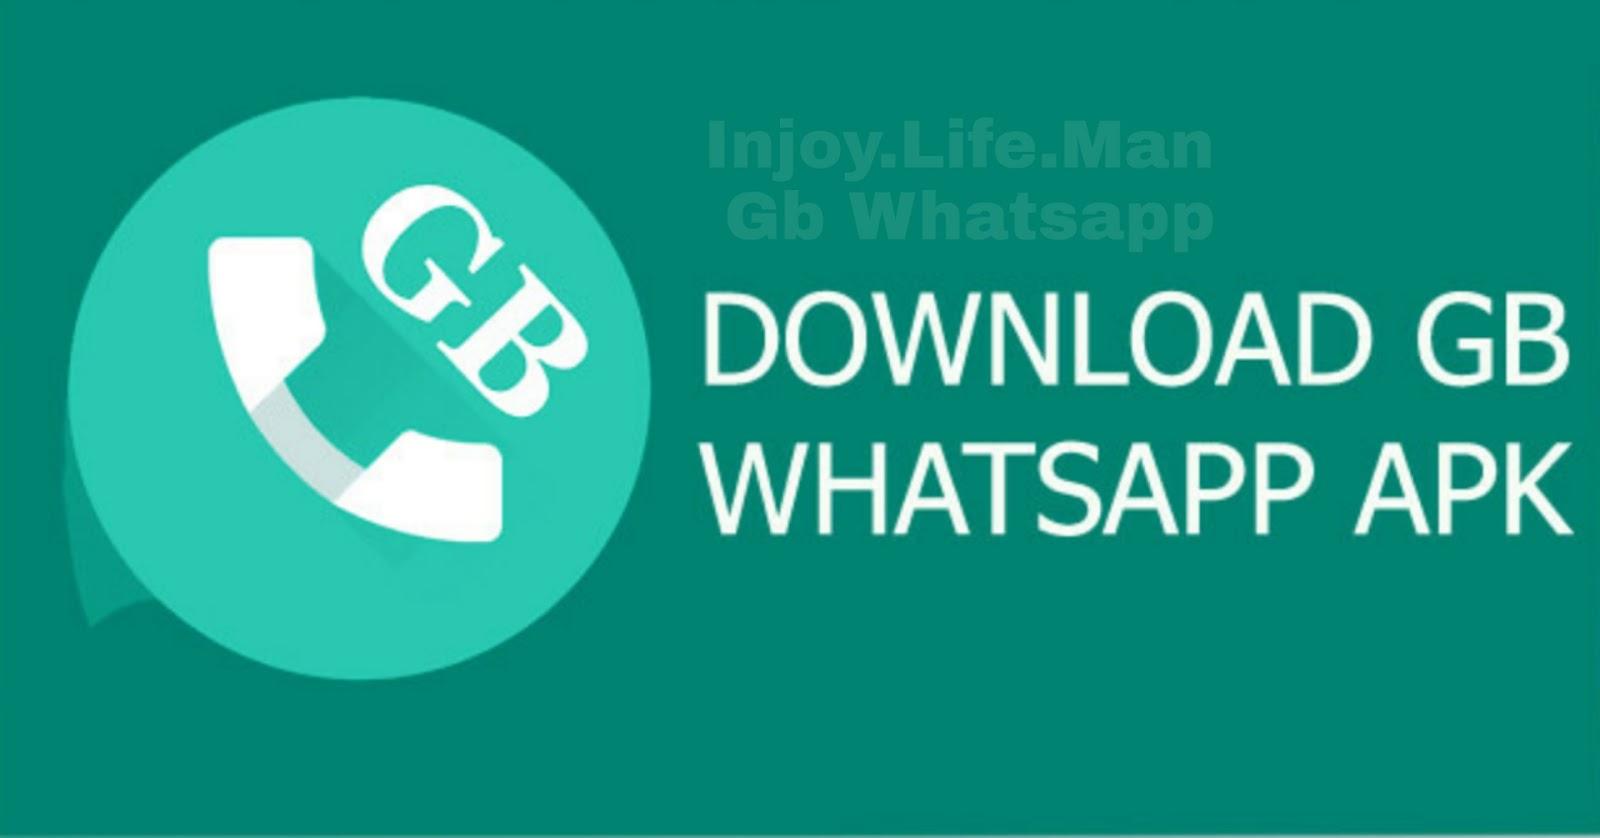 Gbwhatsapp Apk Download Gb Whatsapp 2019 Latest Versiongb